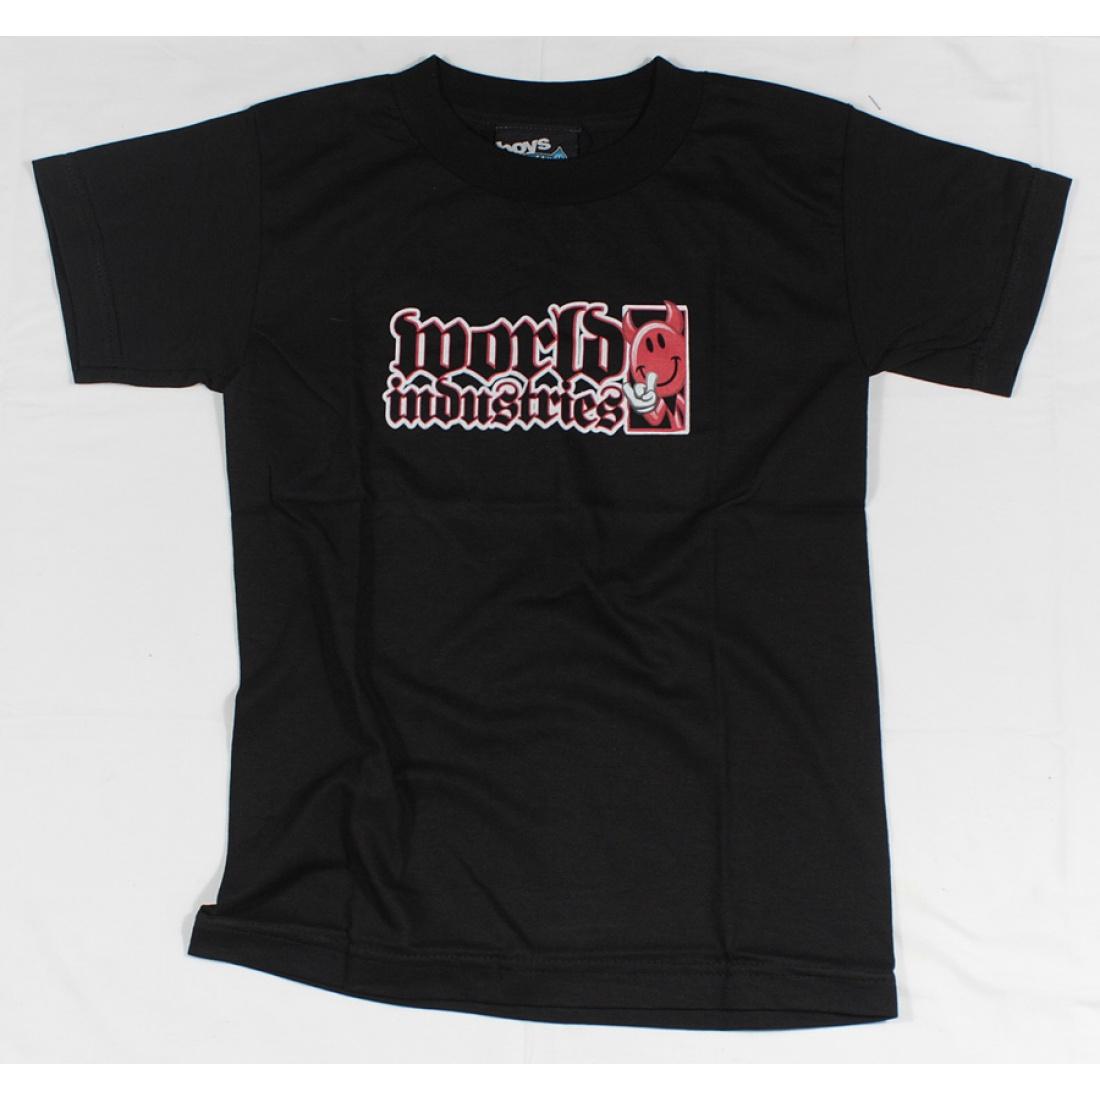 WLD-Devil Classic Boys Black t-shirt Youth Medium